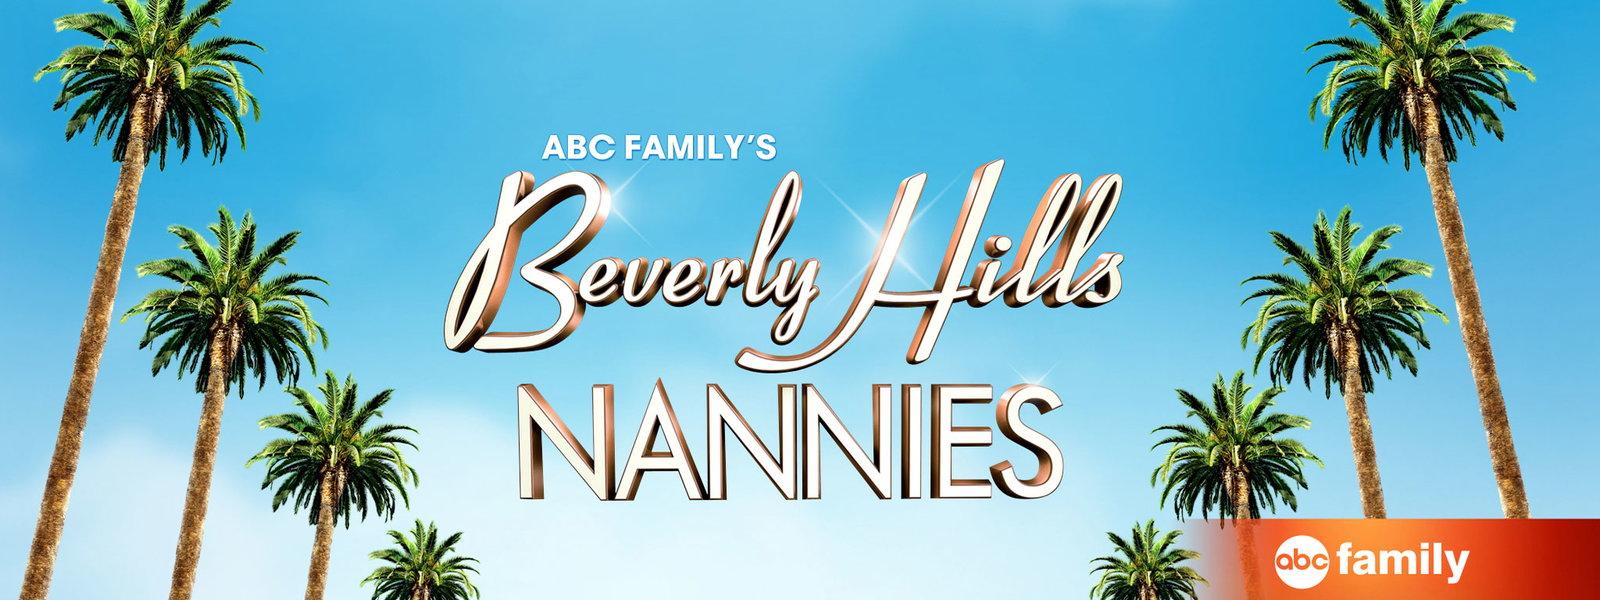 Watch Beverly Hills Nannies Online At Hulu - Us zip code for hulu